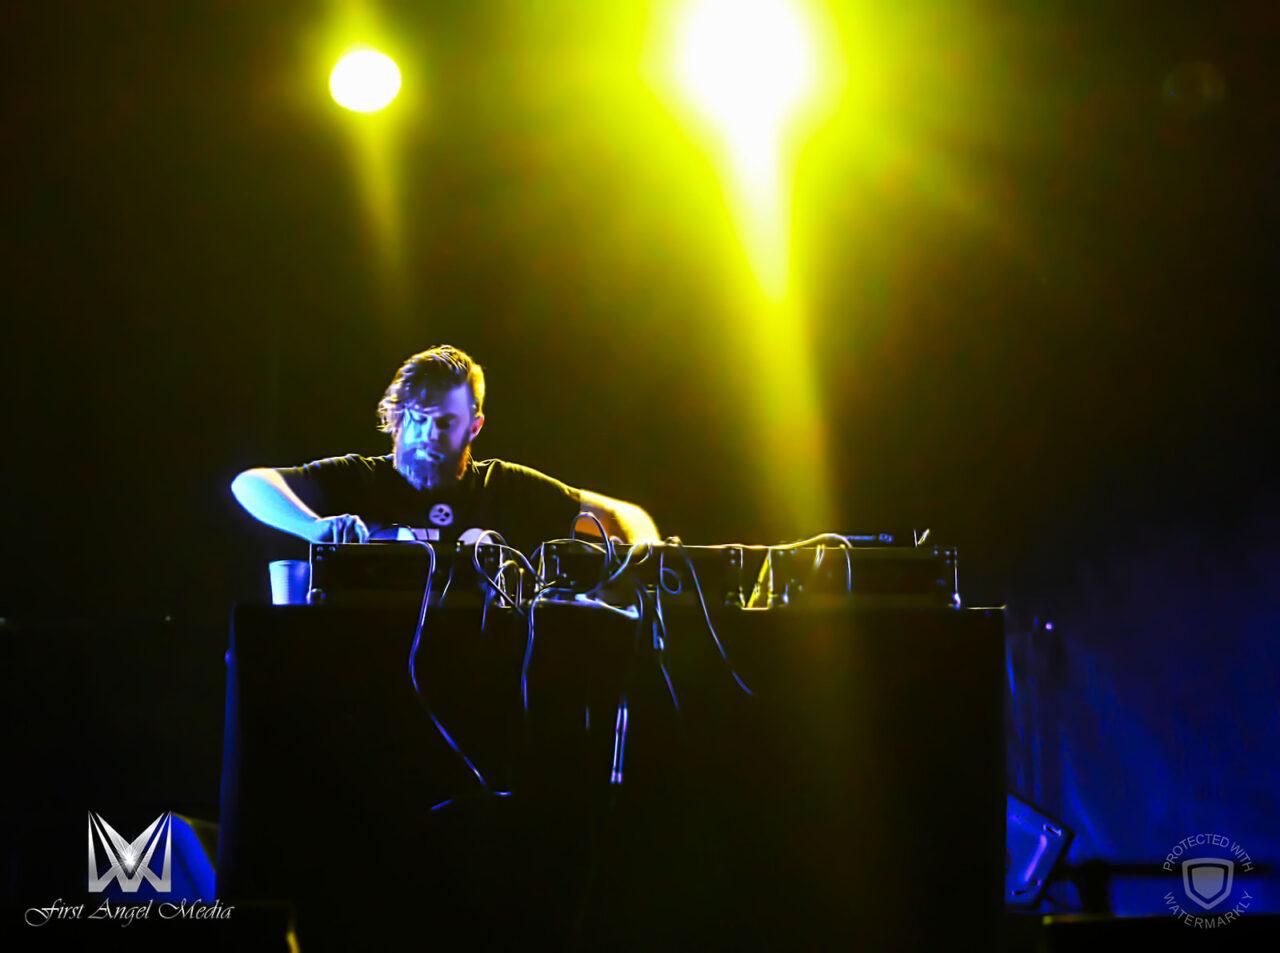 https://www.firstangelmedia.com/wp-content/uploads/2019/09/Thrival_festival_2019_pittsburgh_concert_photography_90-1280x953.jpg